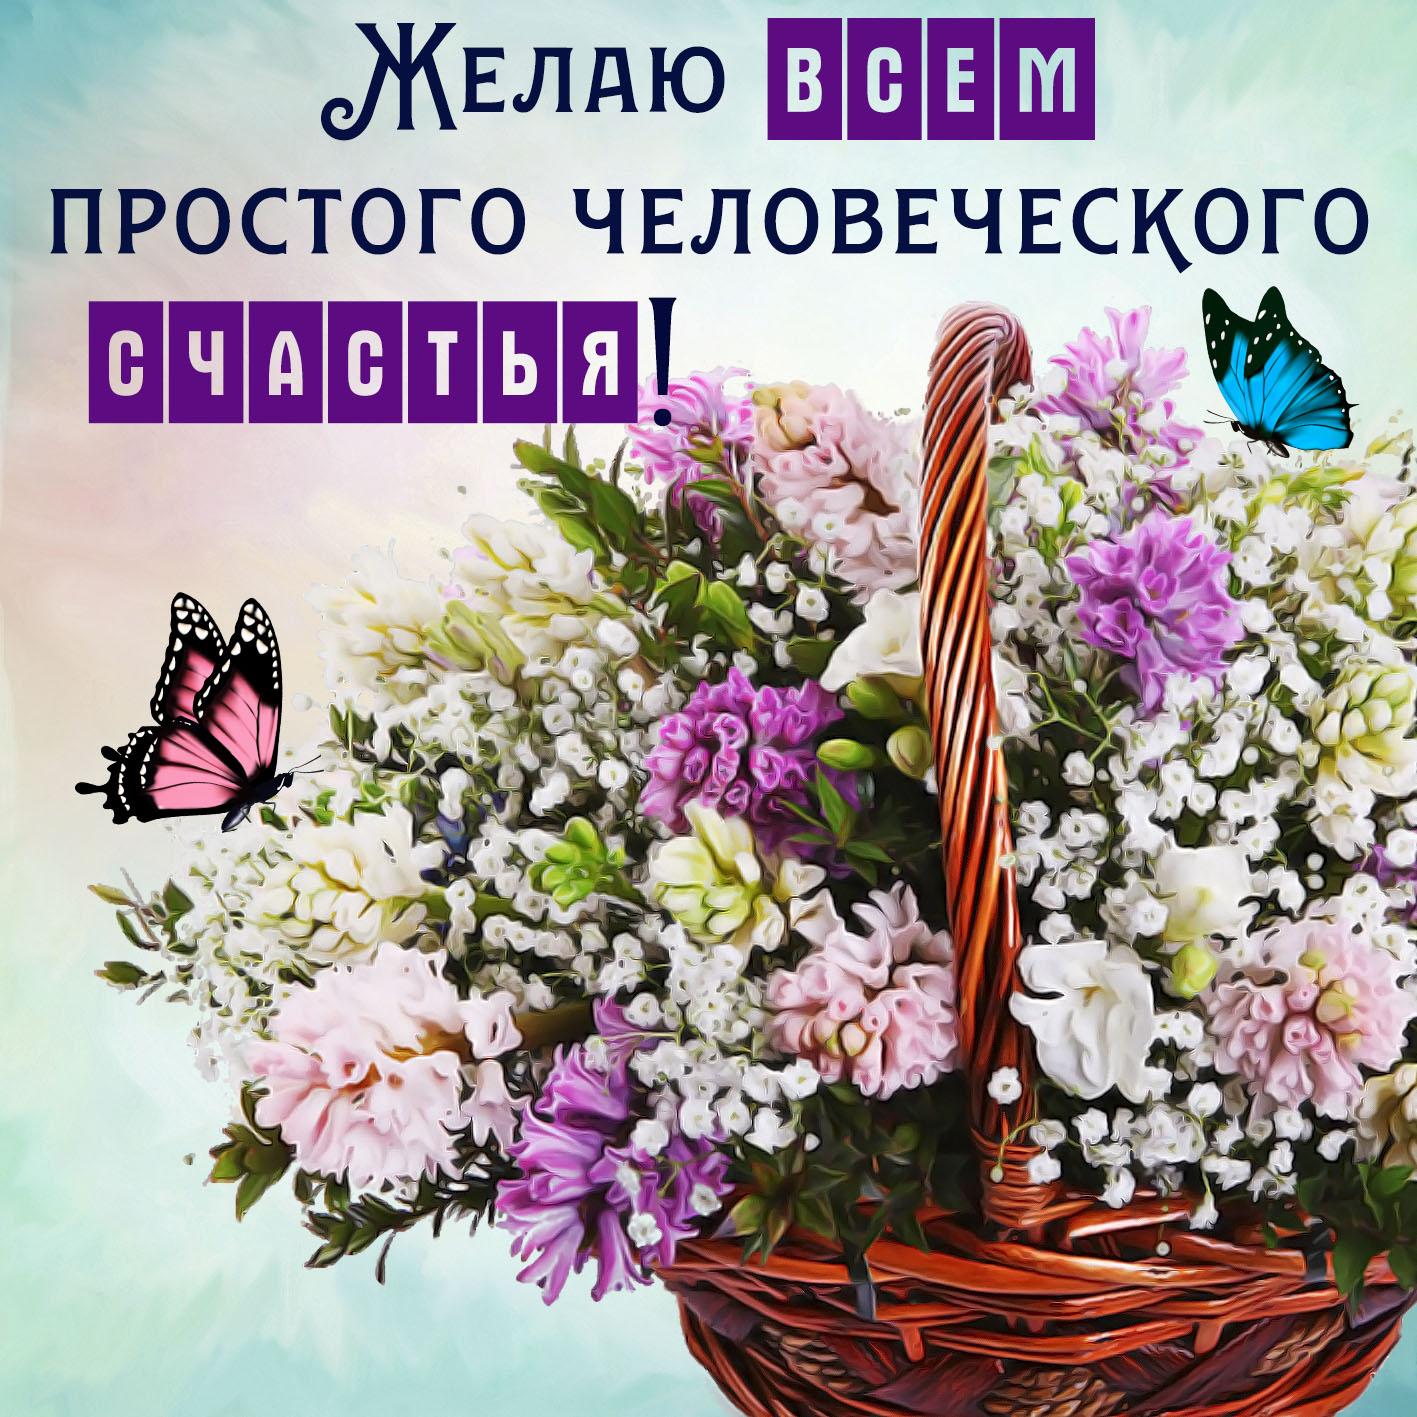 Желтые, картинки цветы желаю счастья